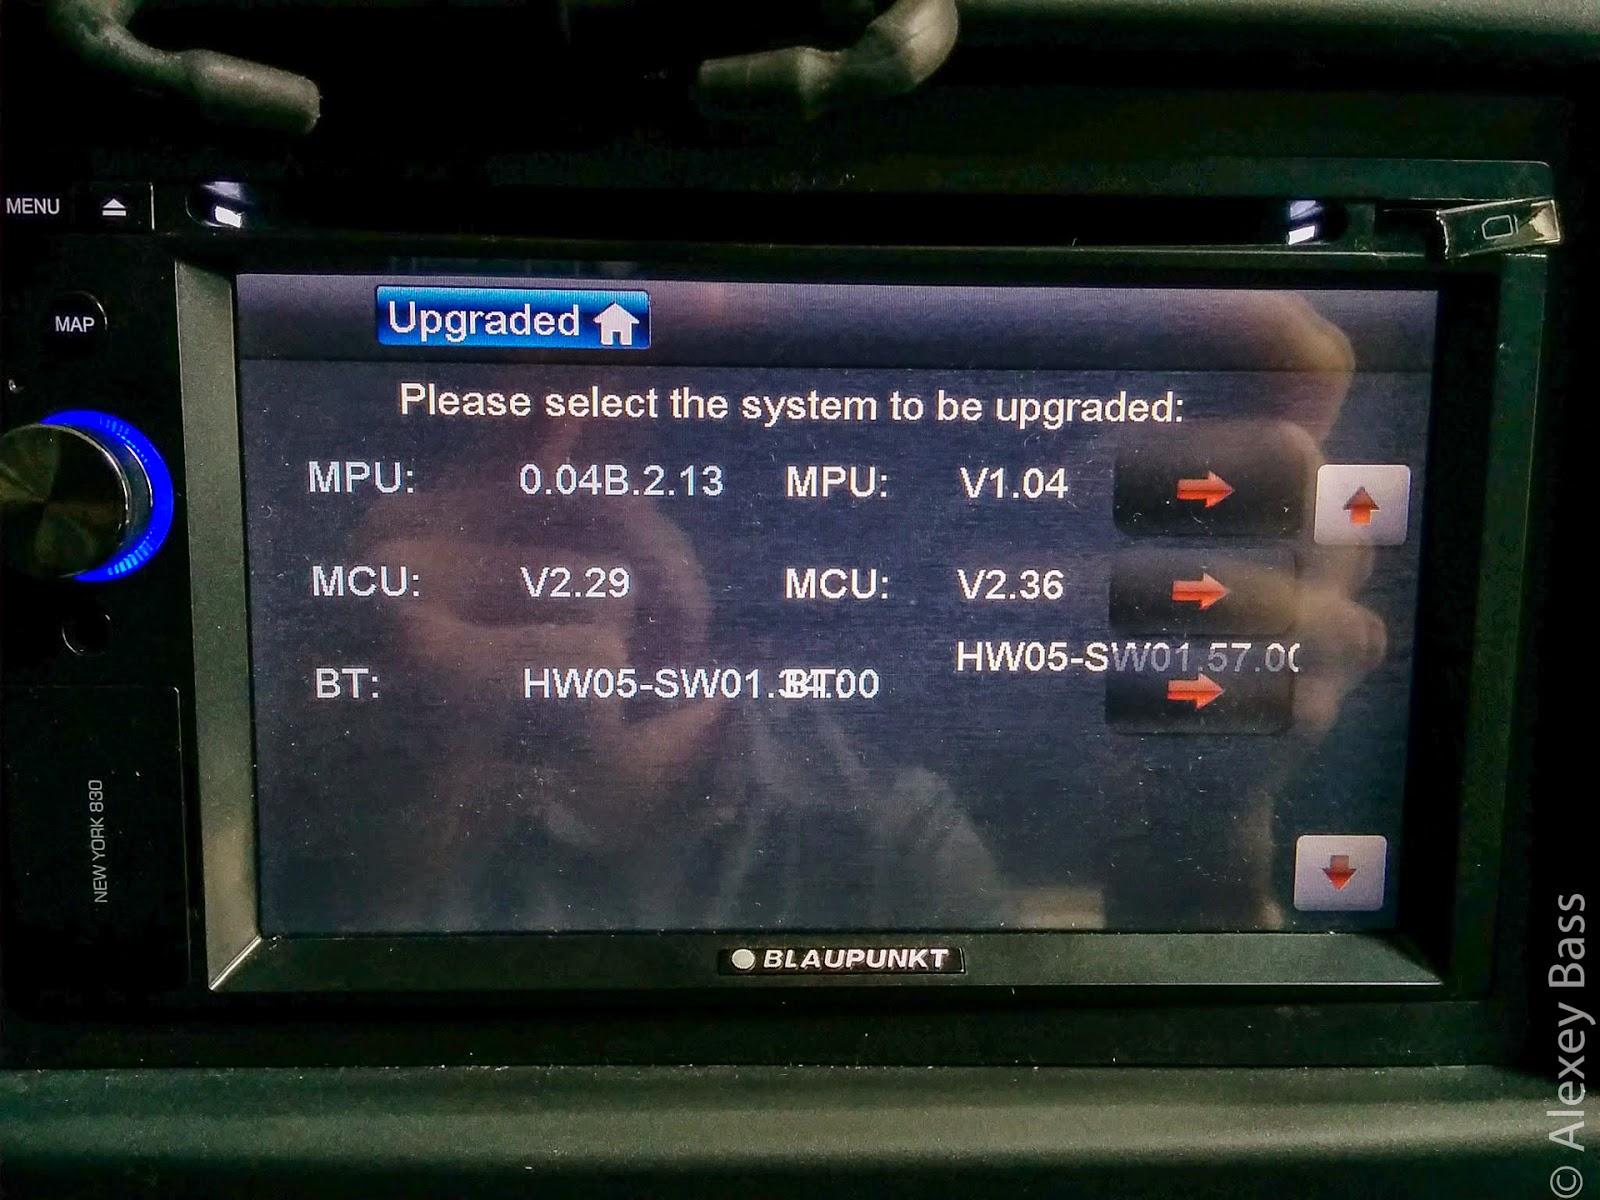 New Honda Civic Hatchback Mk9 2013: Blaupunkt New York 830 firmware